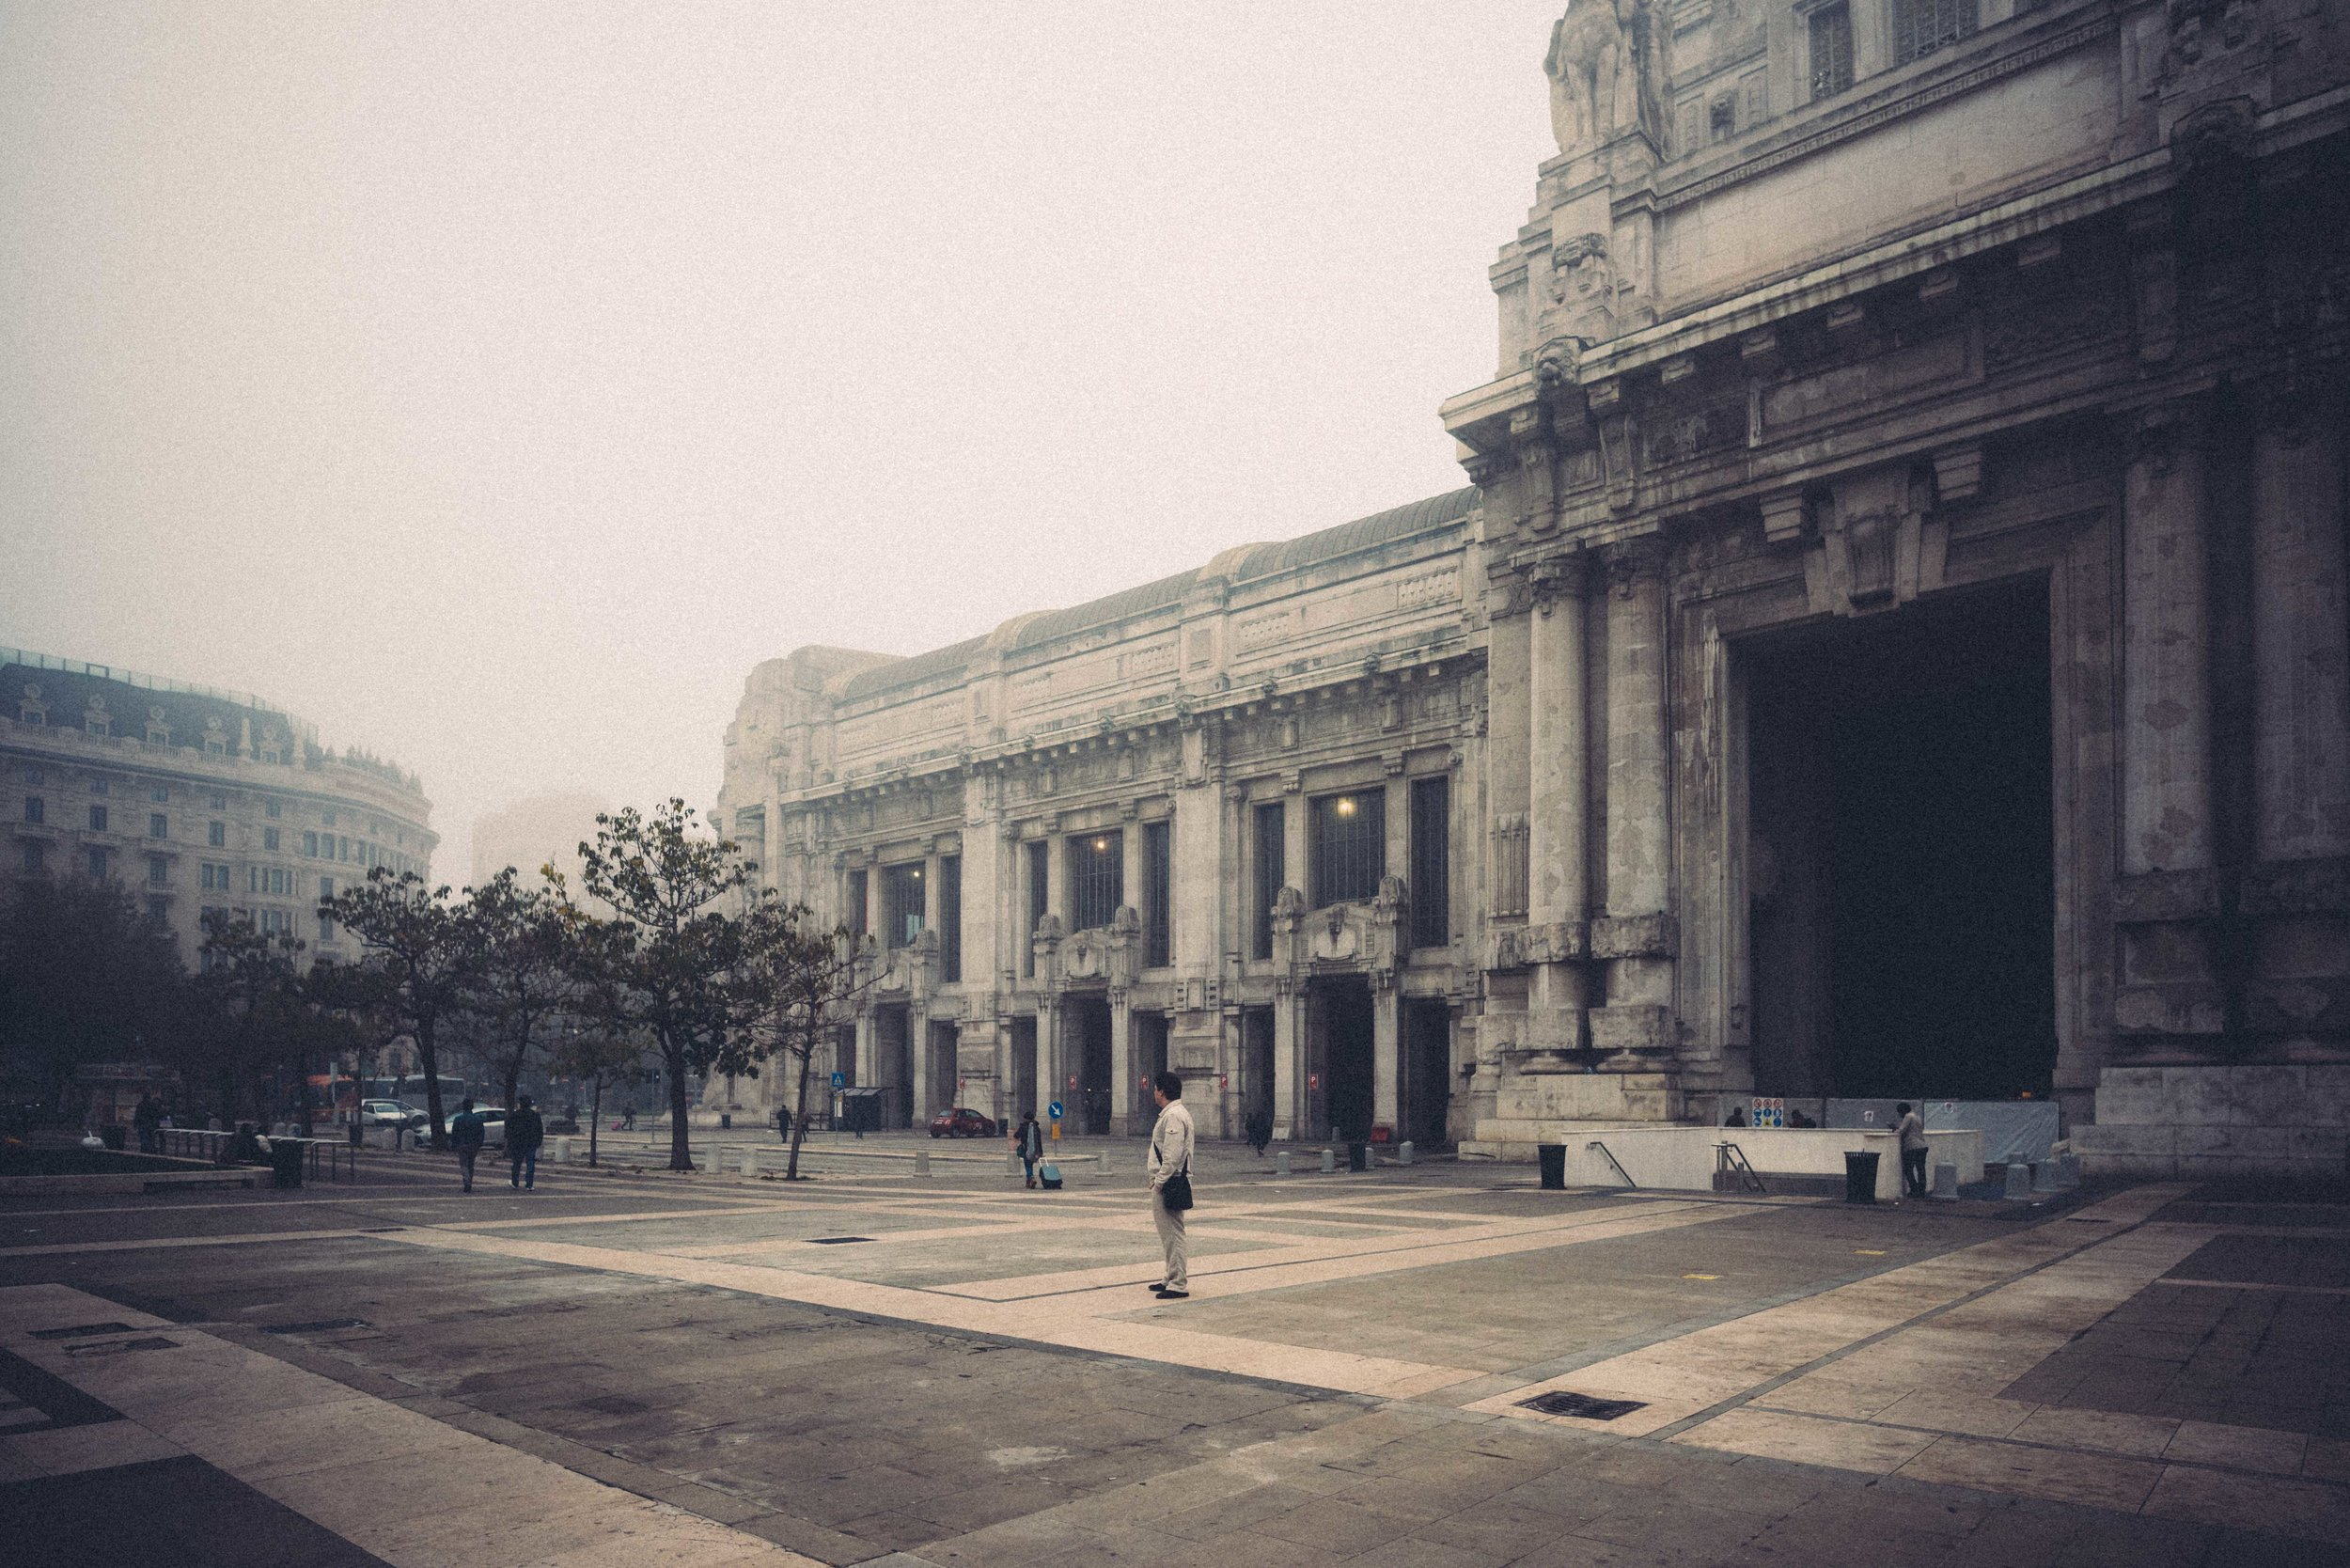 5_14-11-15 milano nebbia alba-221.jpg